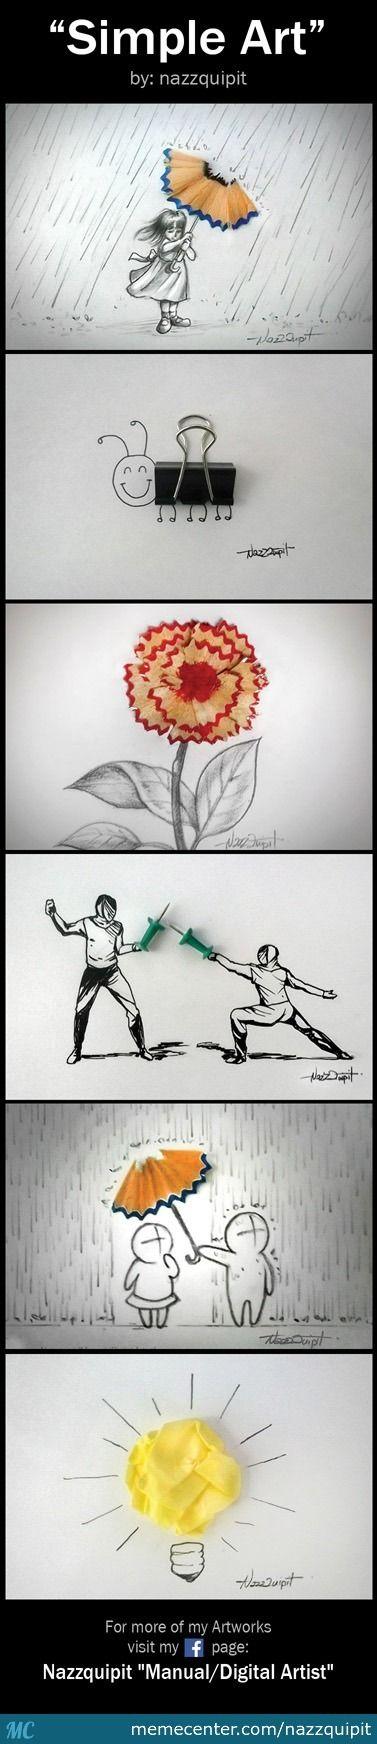 Simple Art - Meme Center